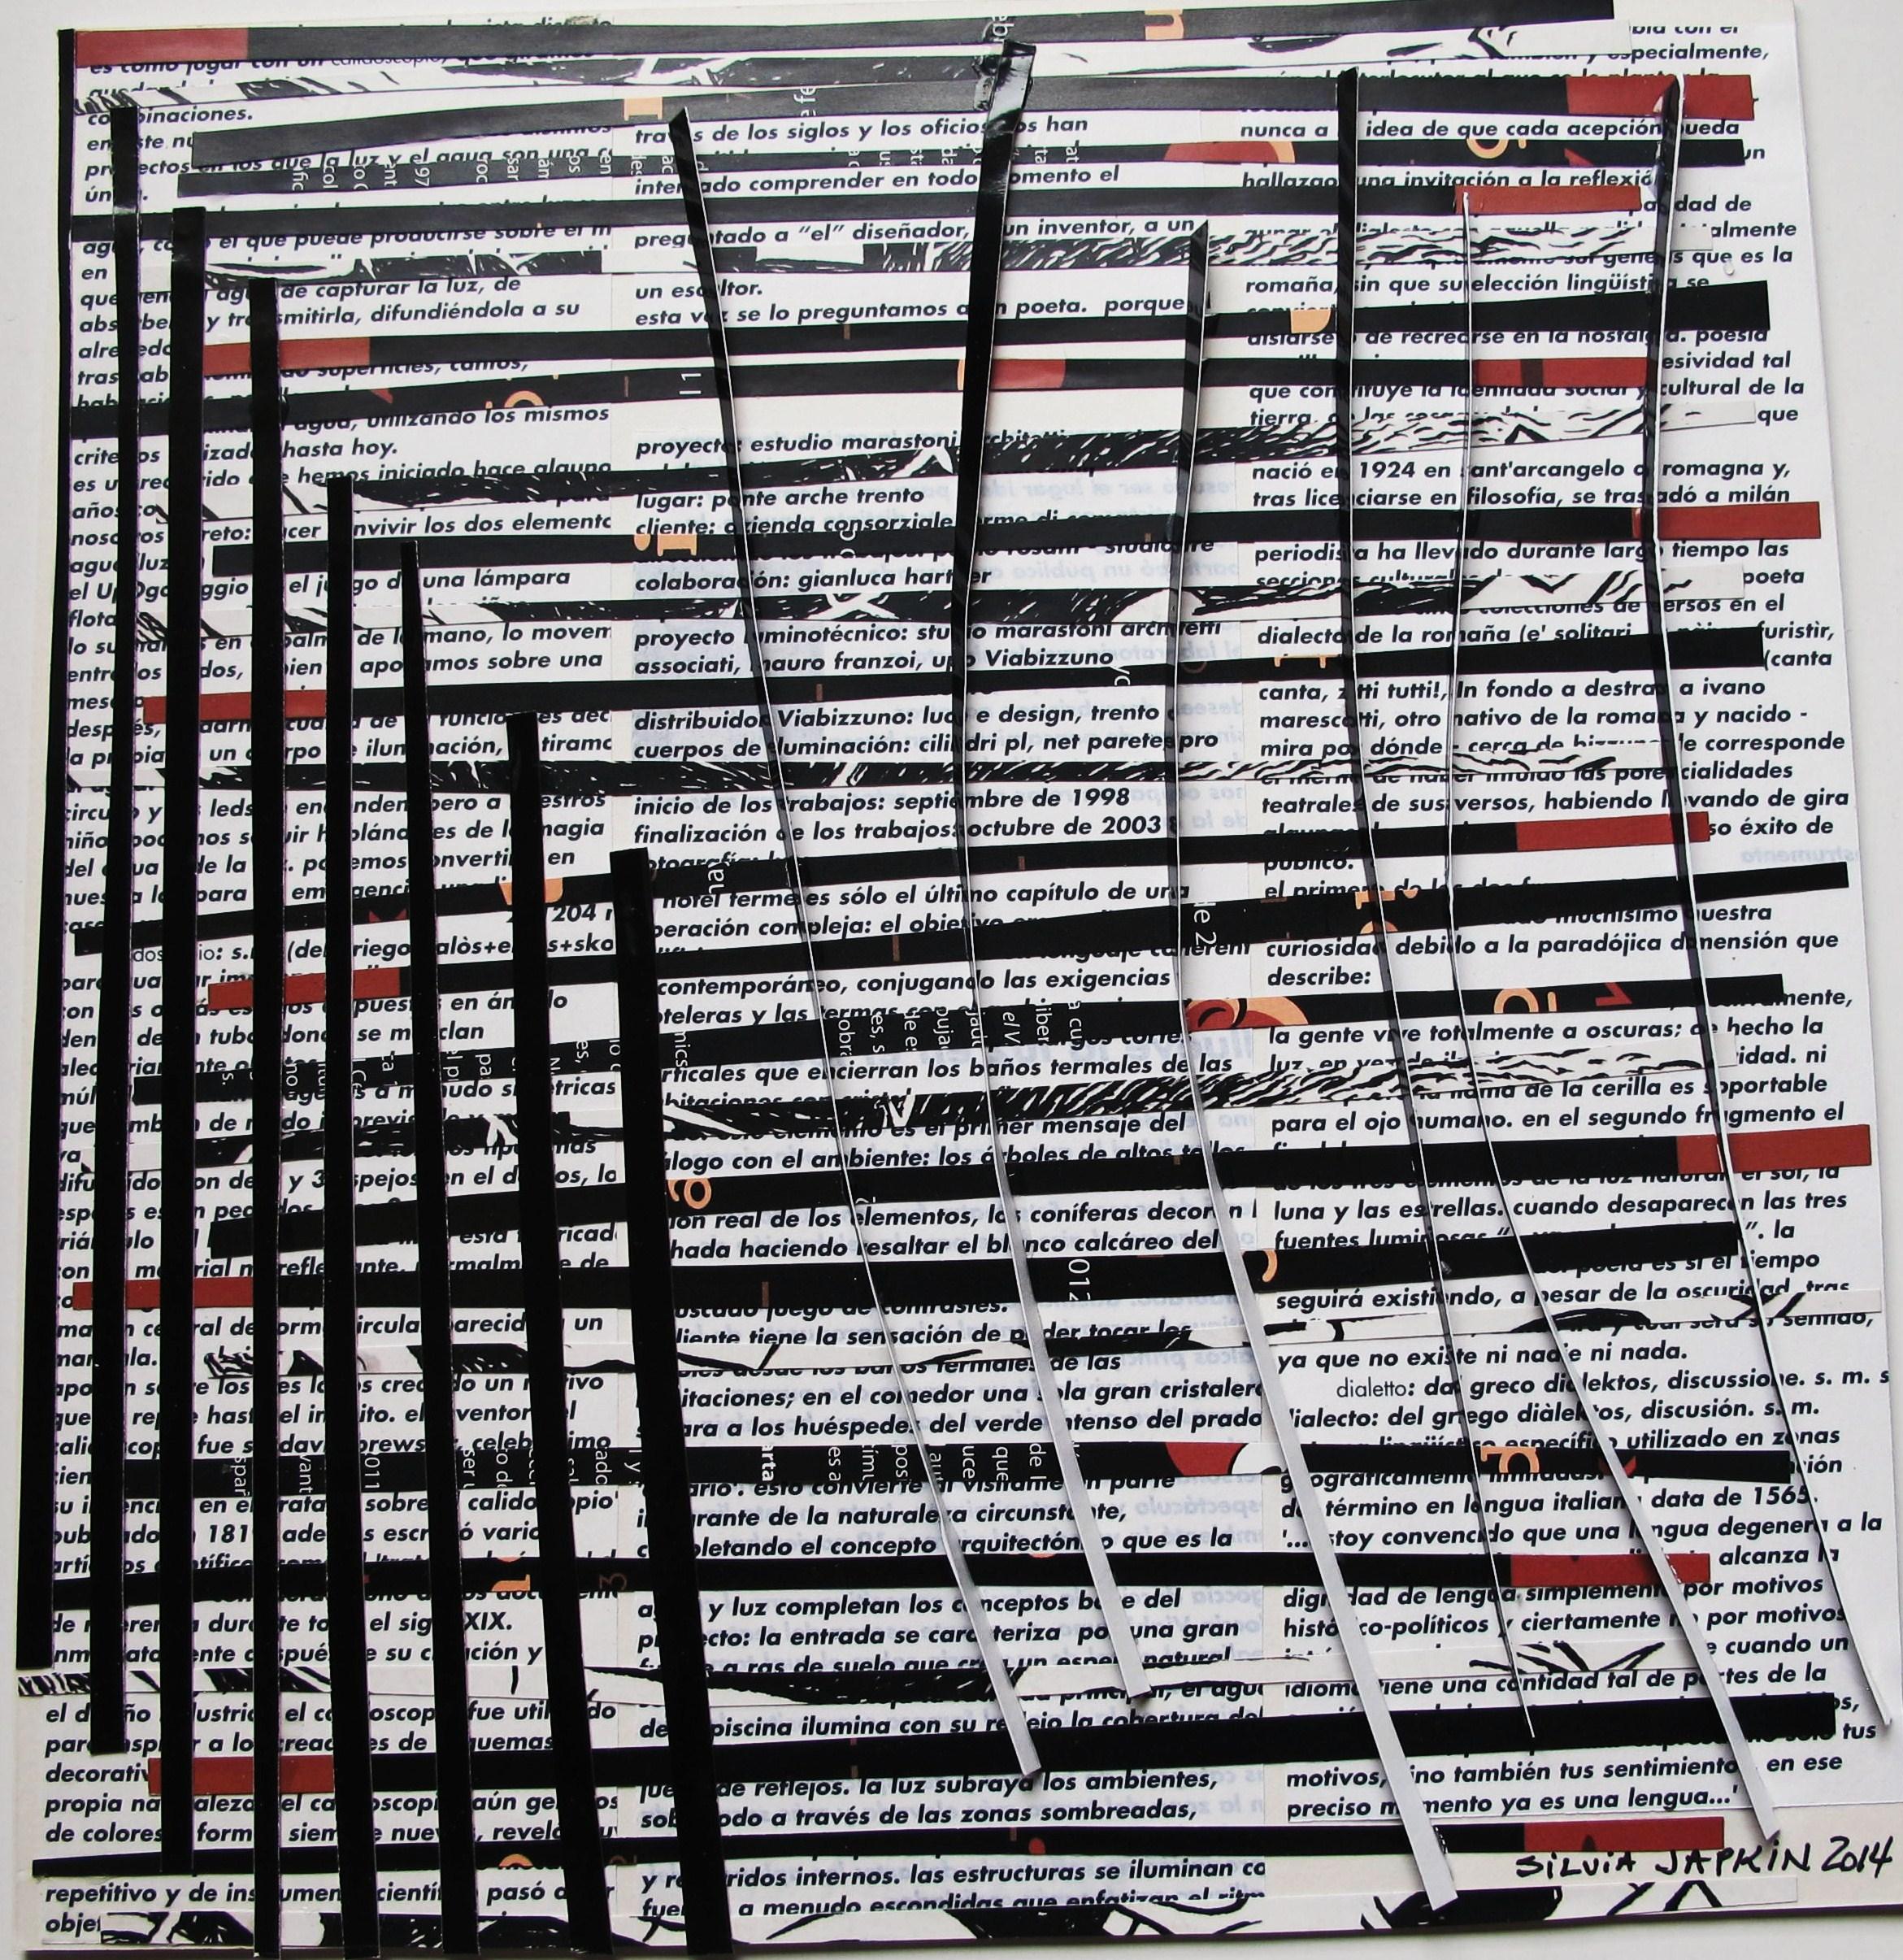 Silvia Japkin - Collage - 3